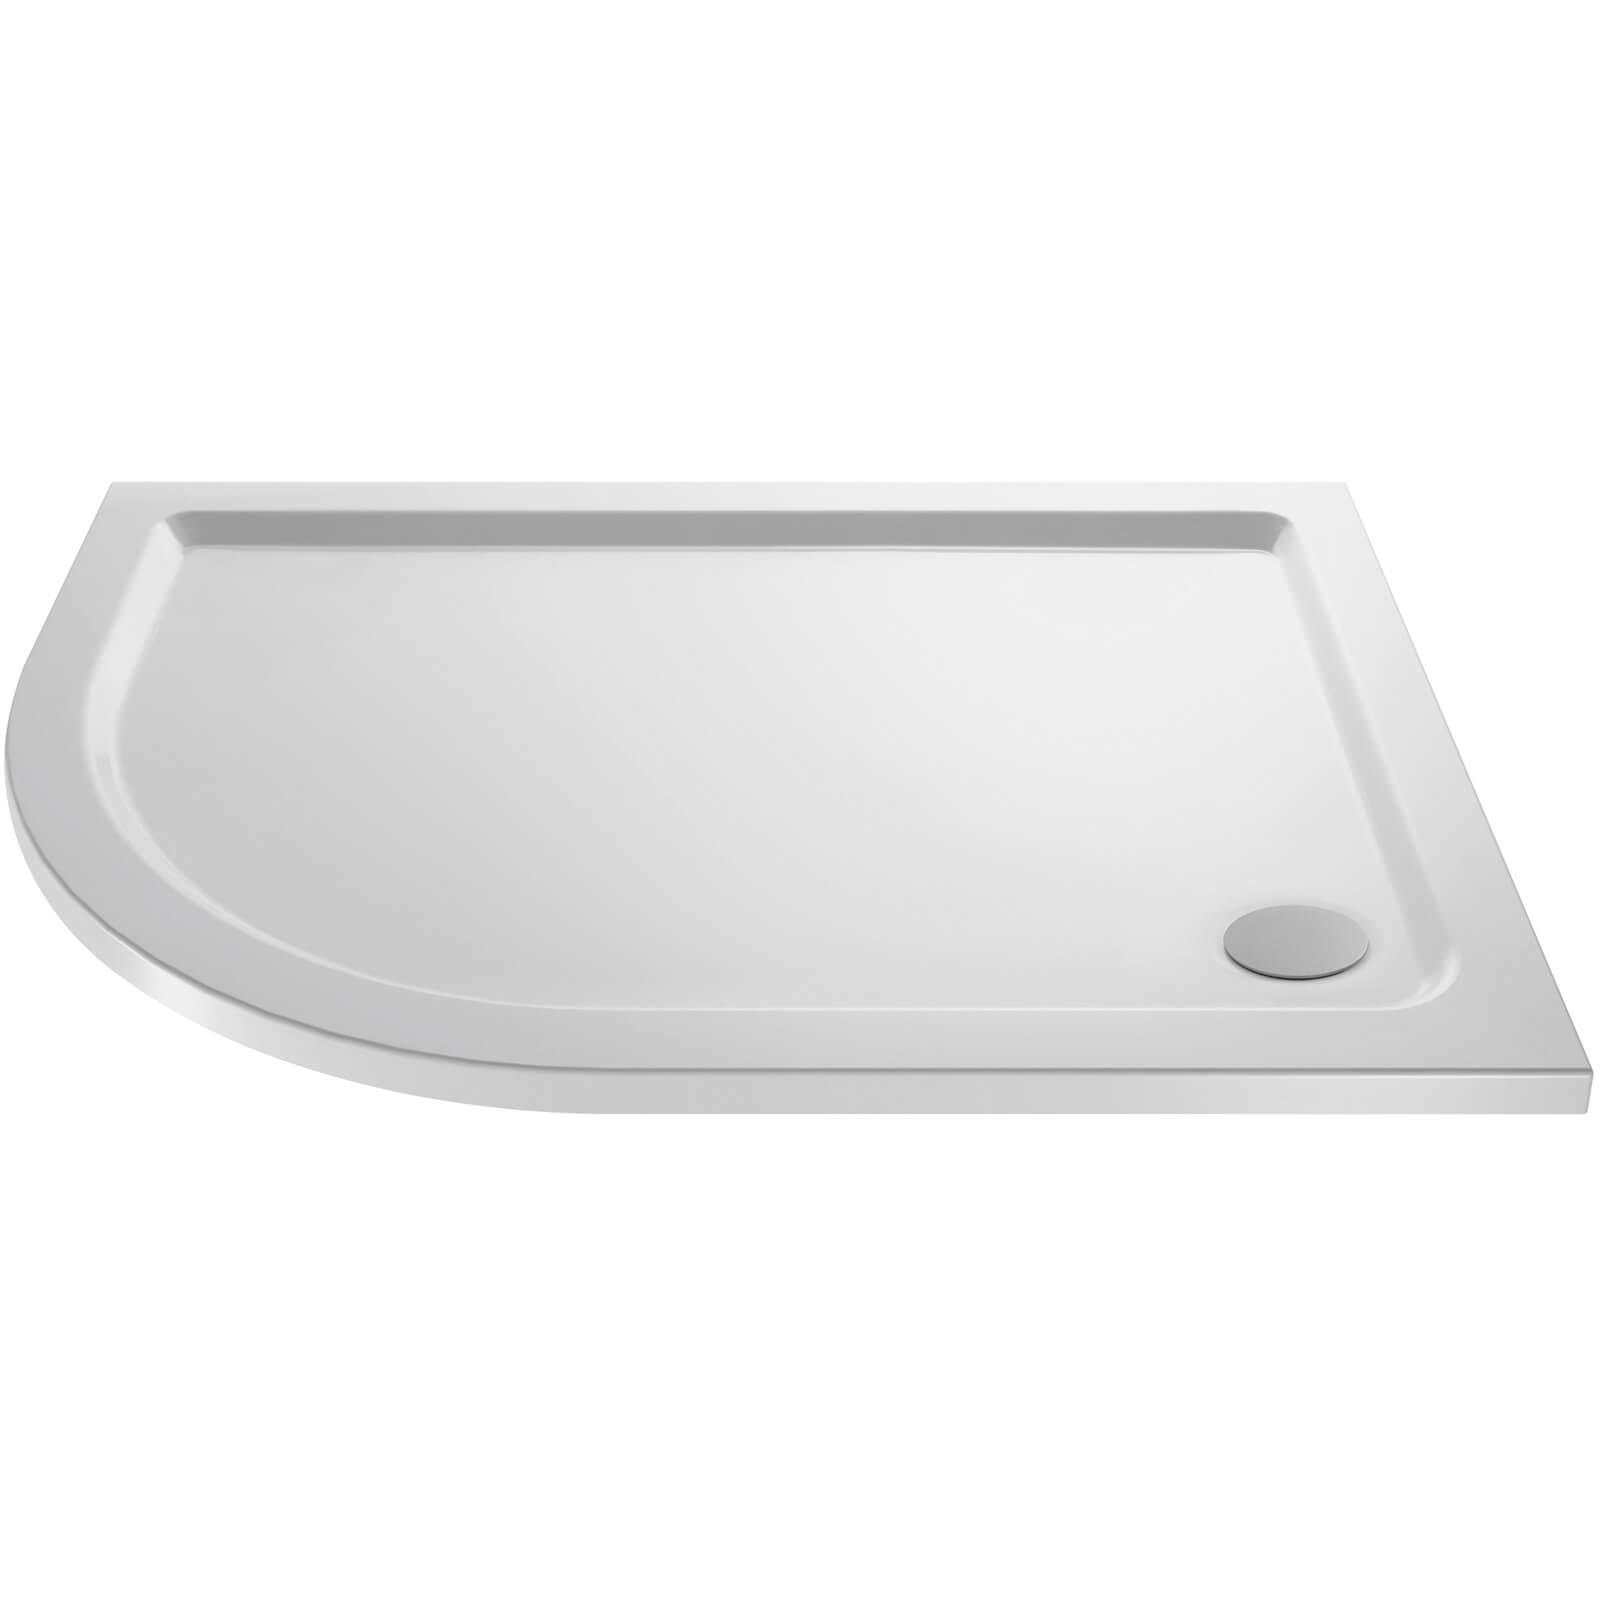 Balterley Left Hand Offset Quadrant Shower Tray - 900 x 800mm